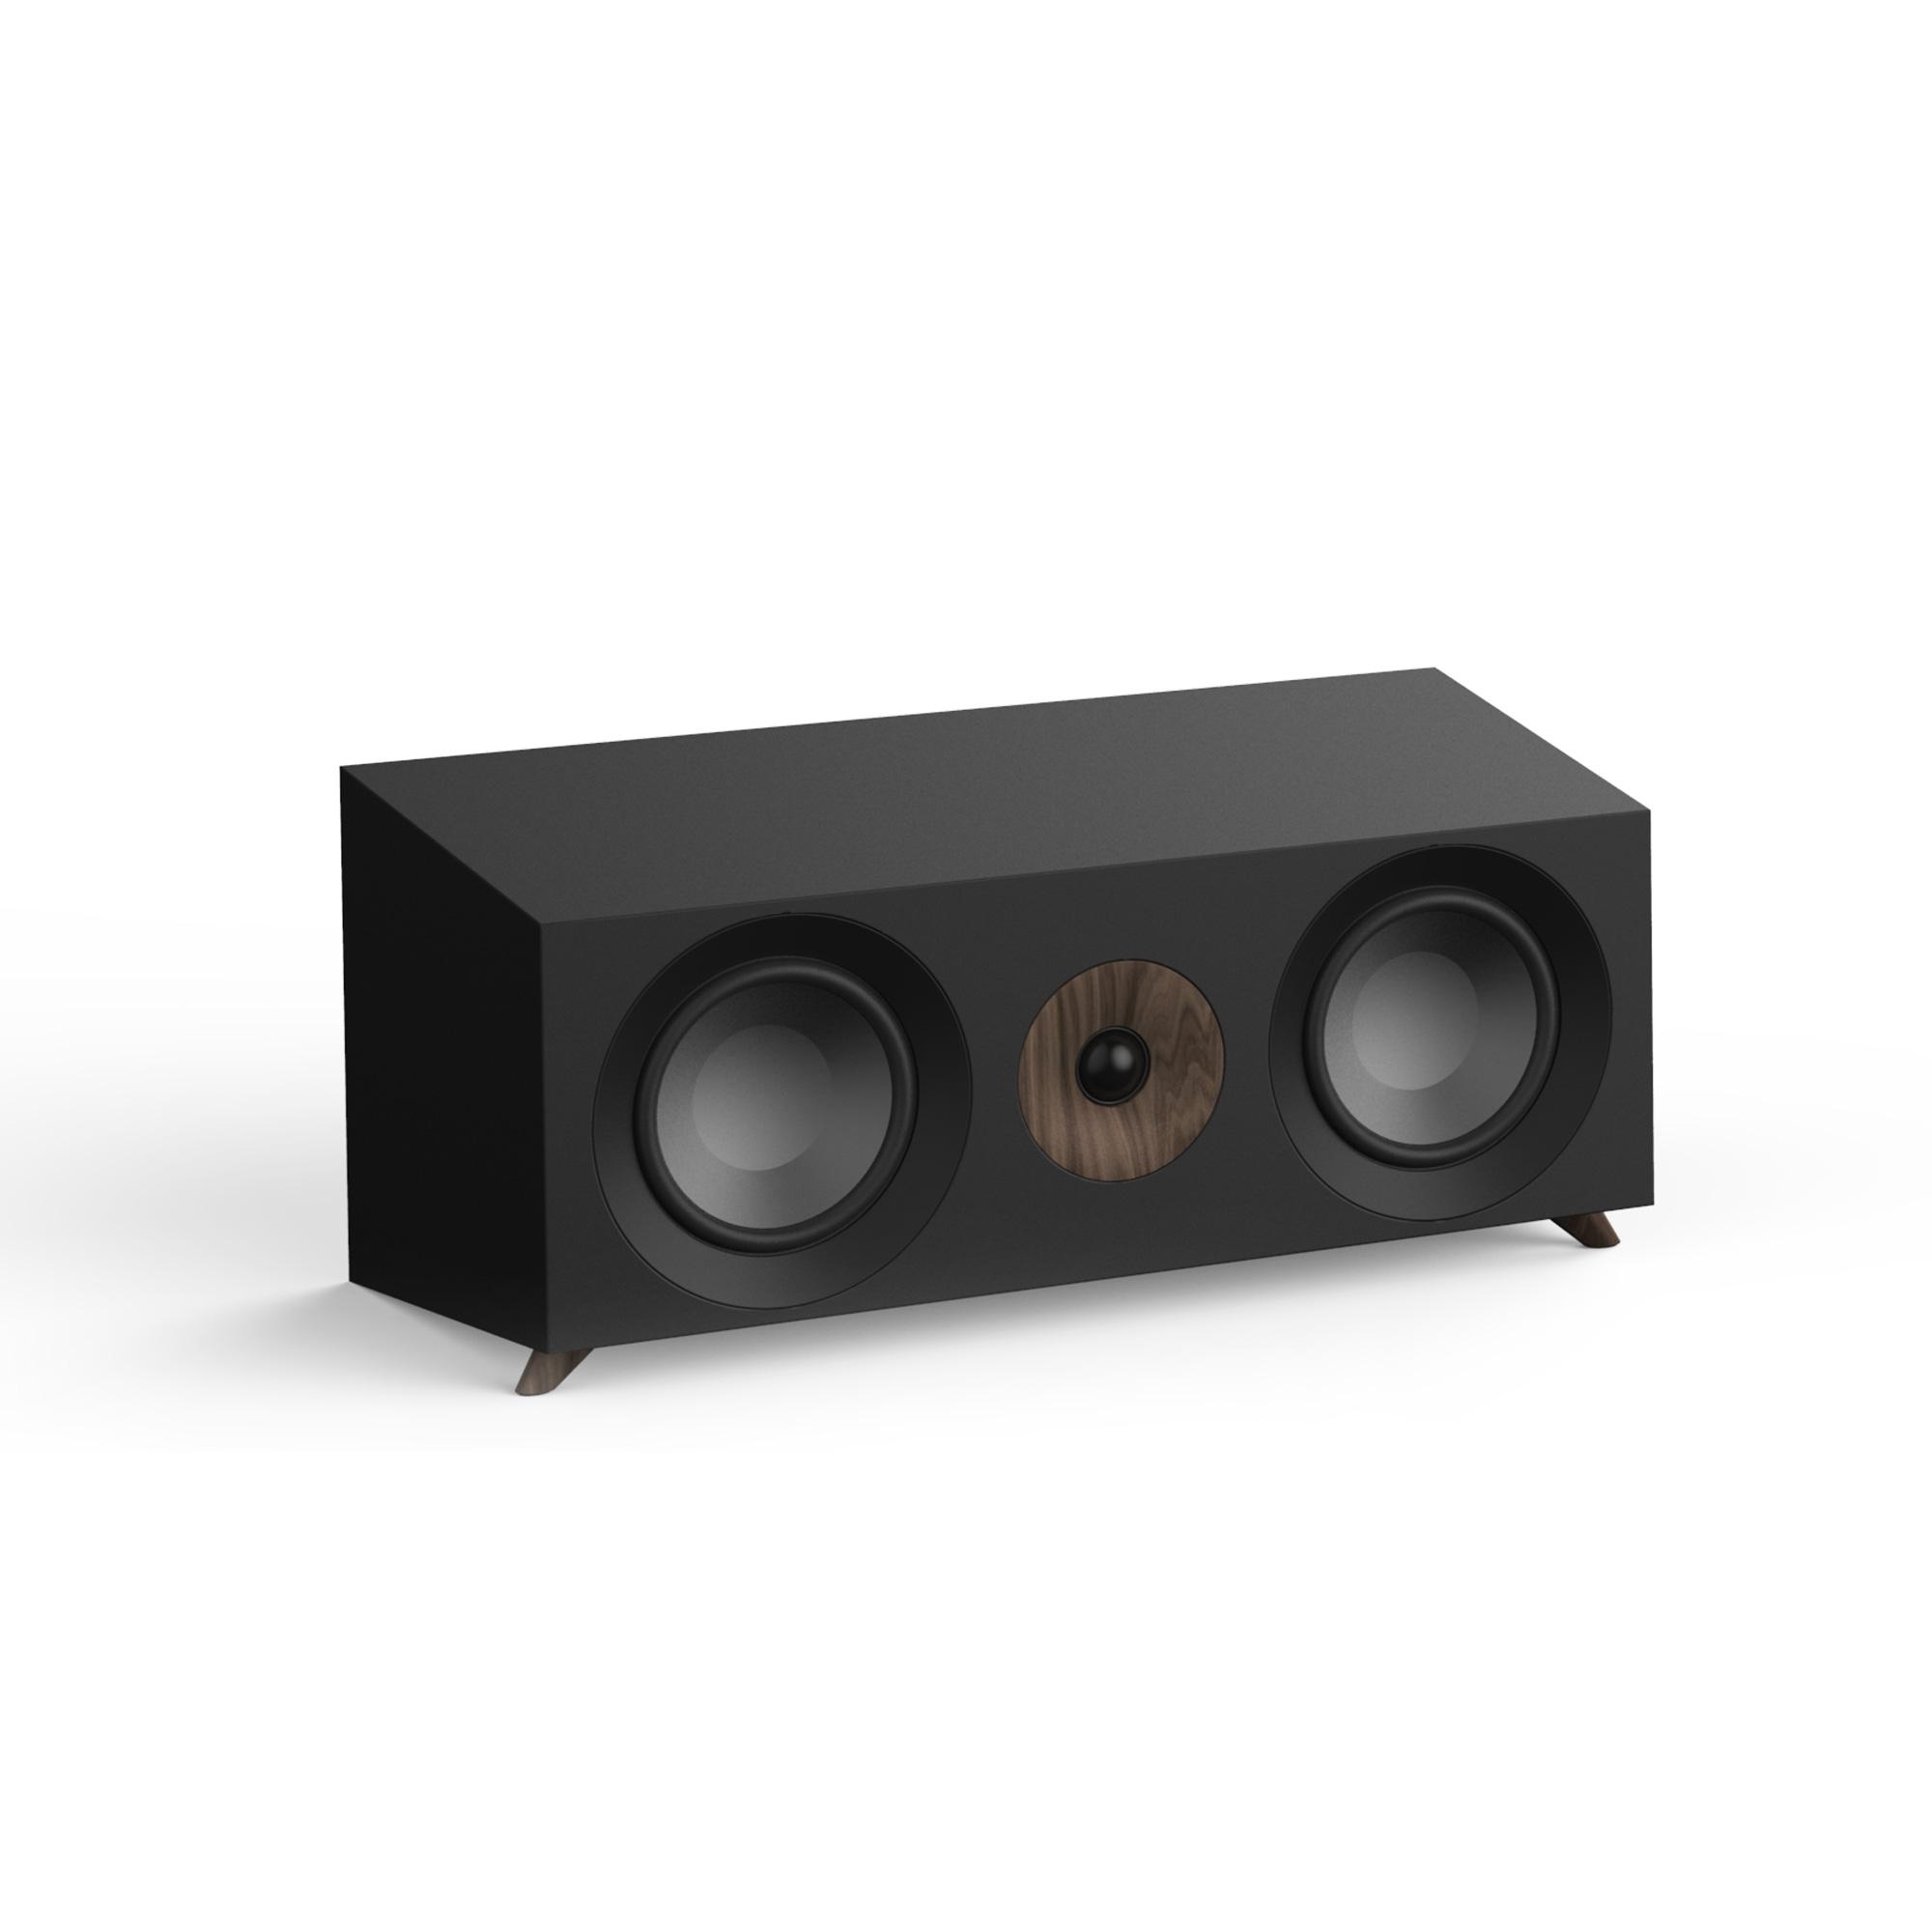 Jamo S 803 HCS 5 0 Black | Audio, HiFi | TV, Audio, Video